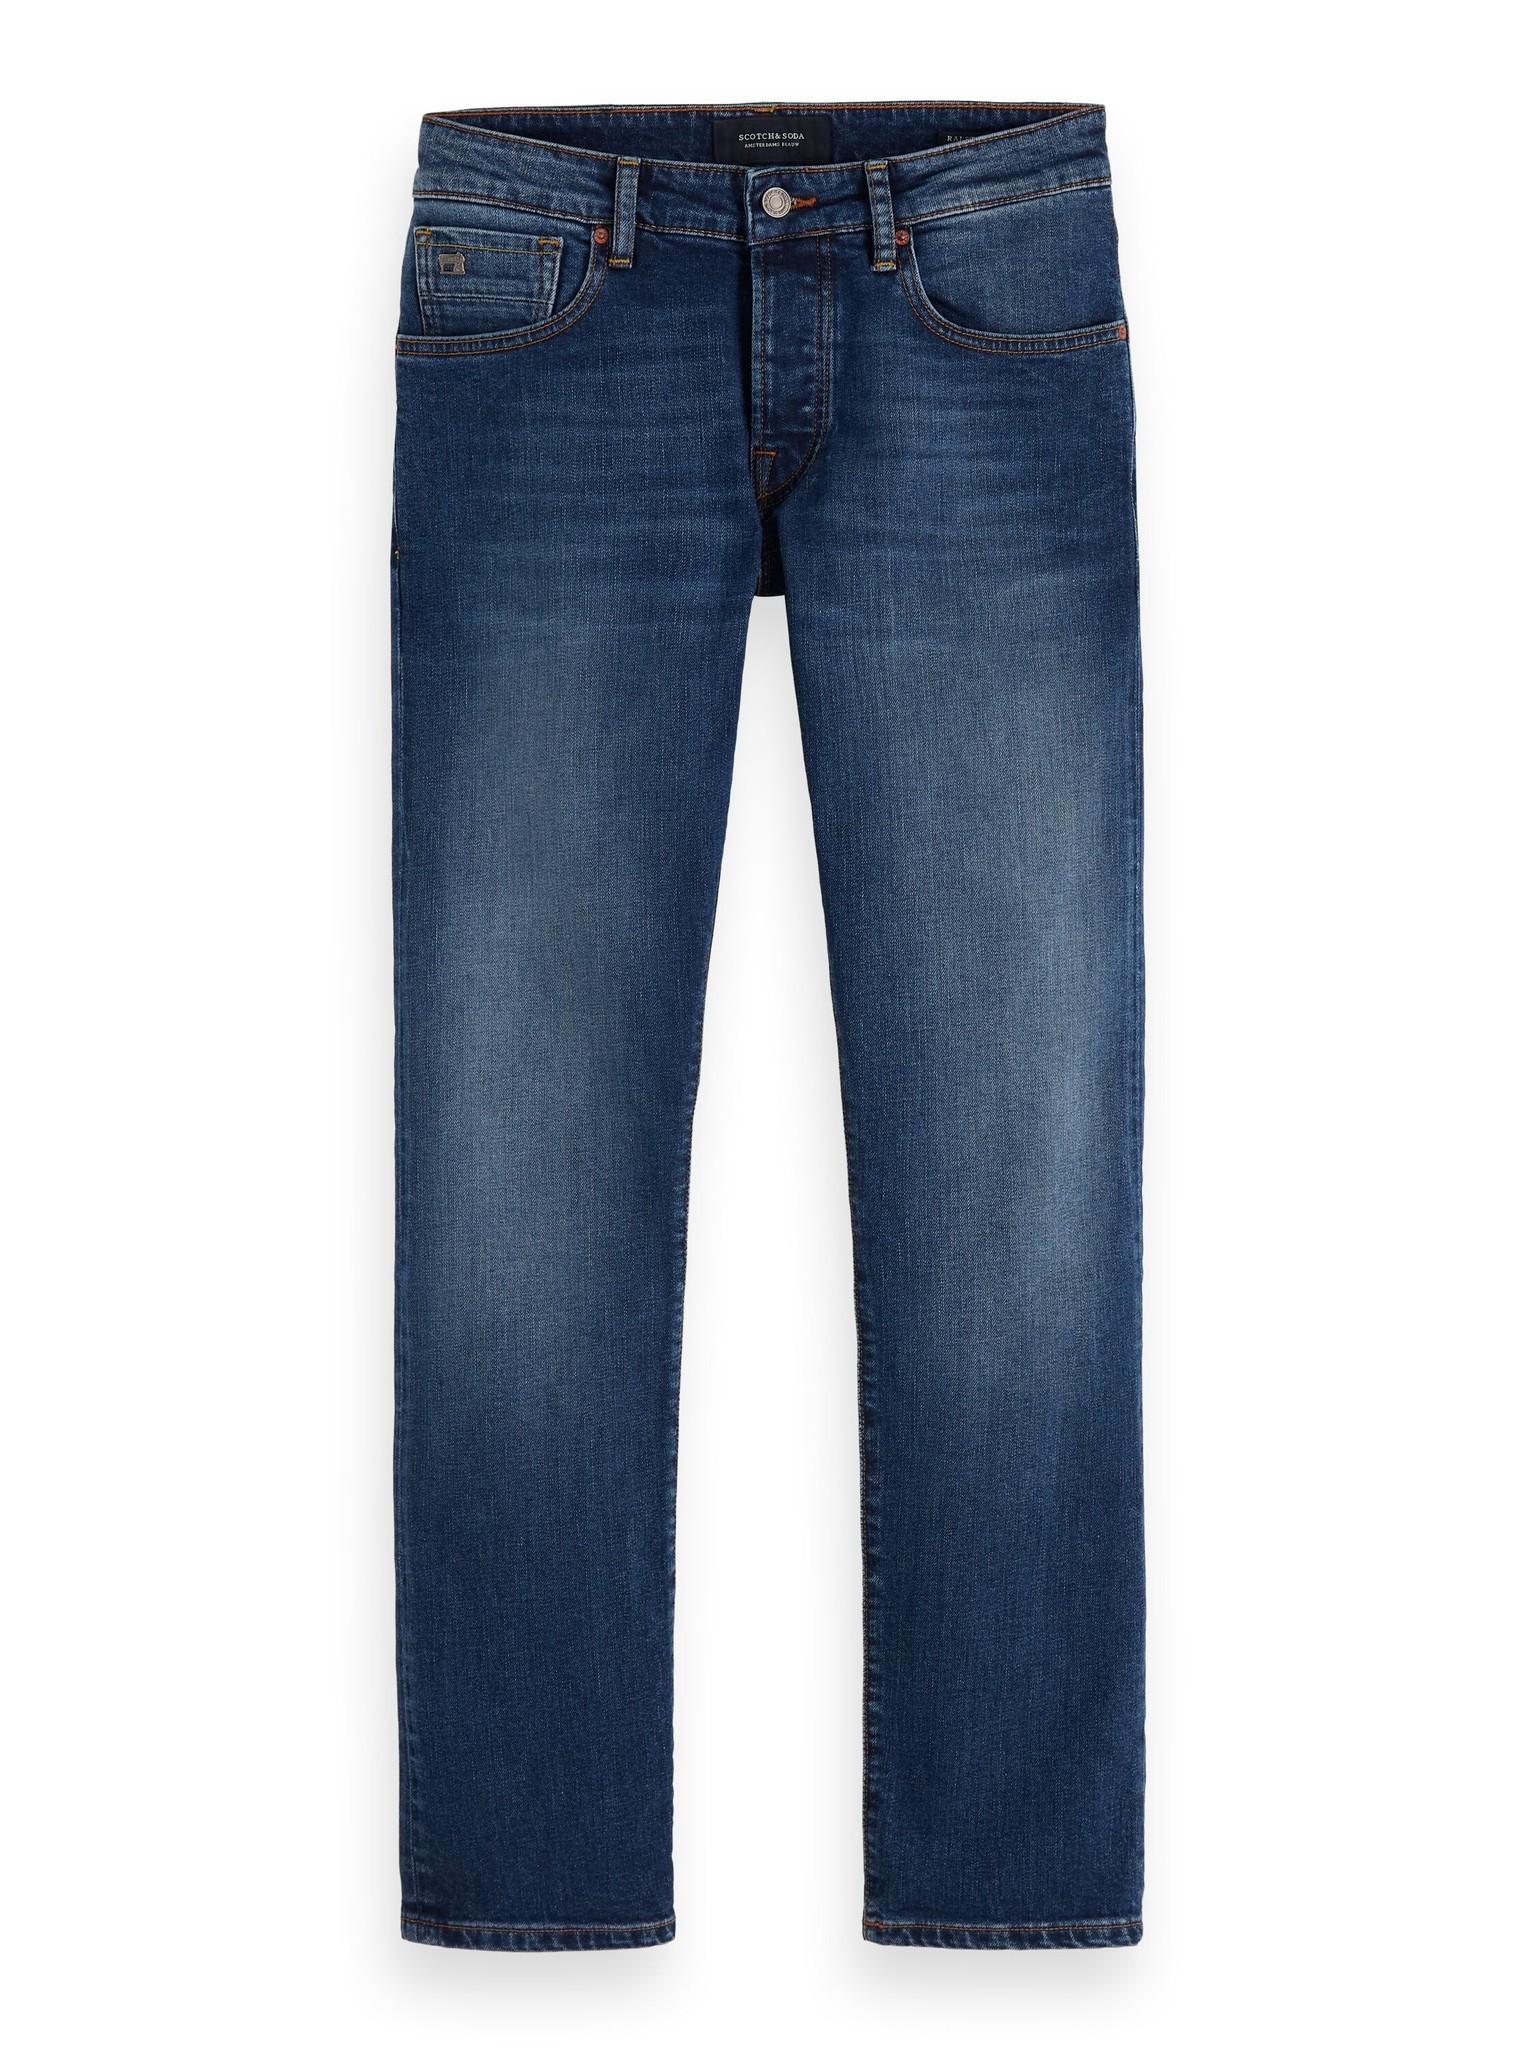 Scotch & Soda Tye Blue Jeans